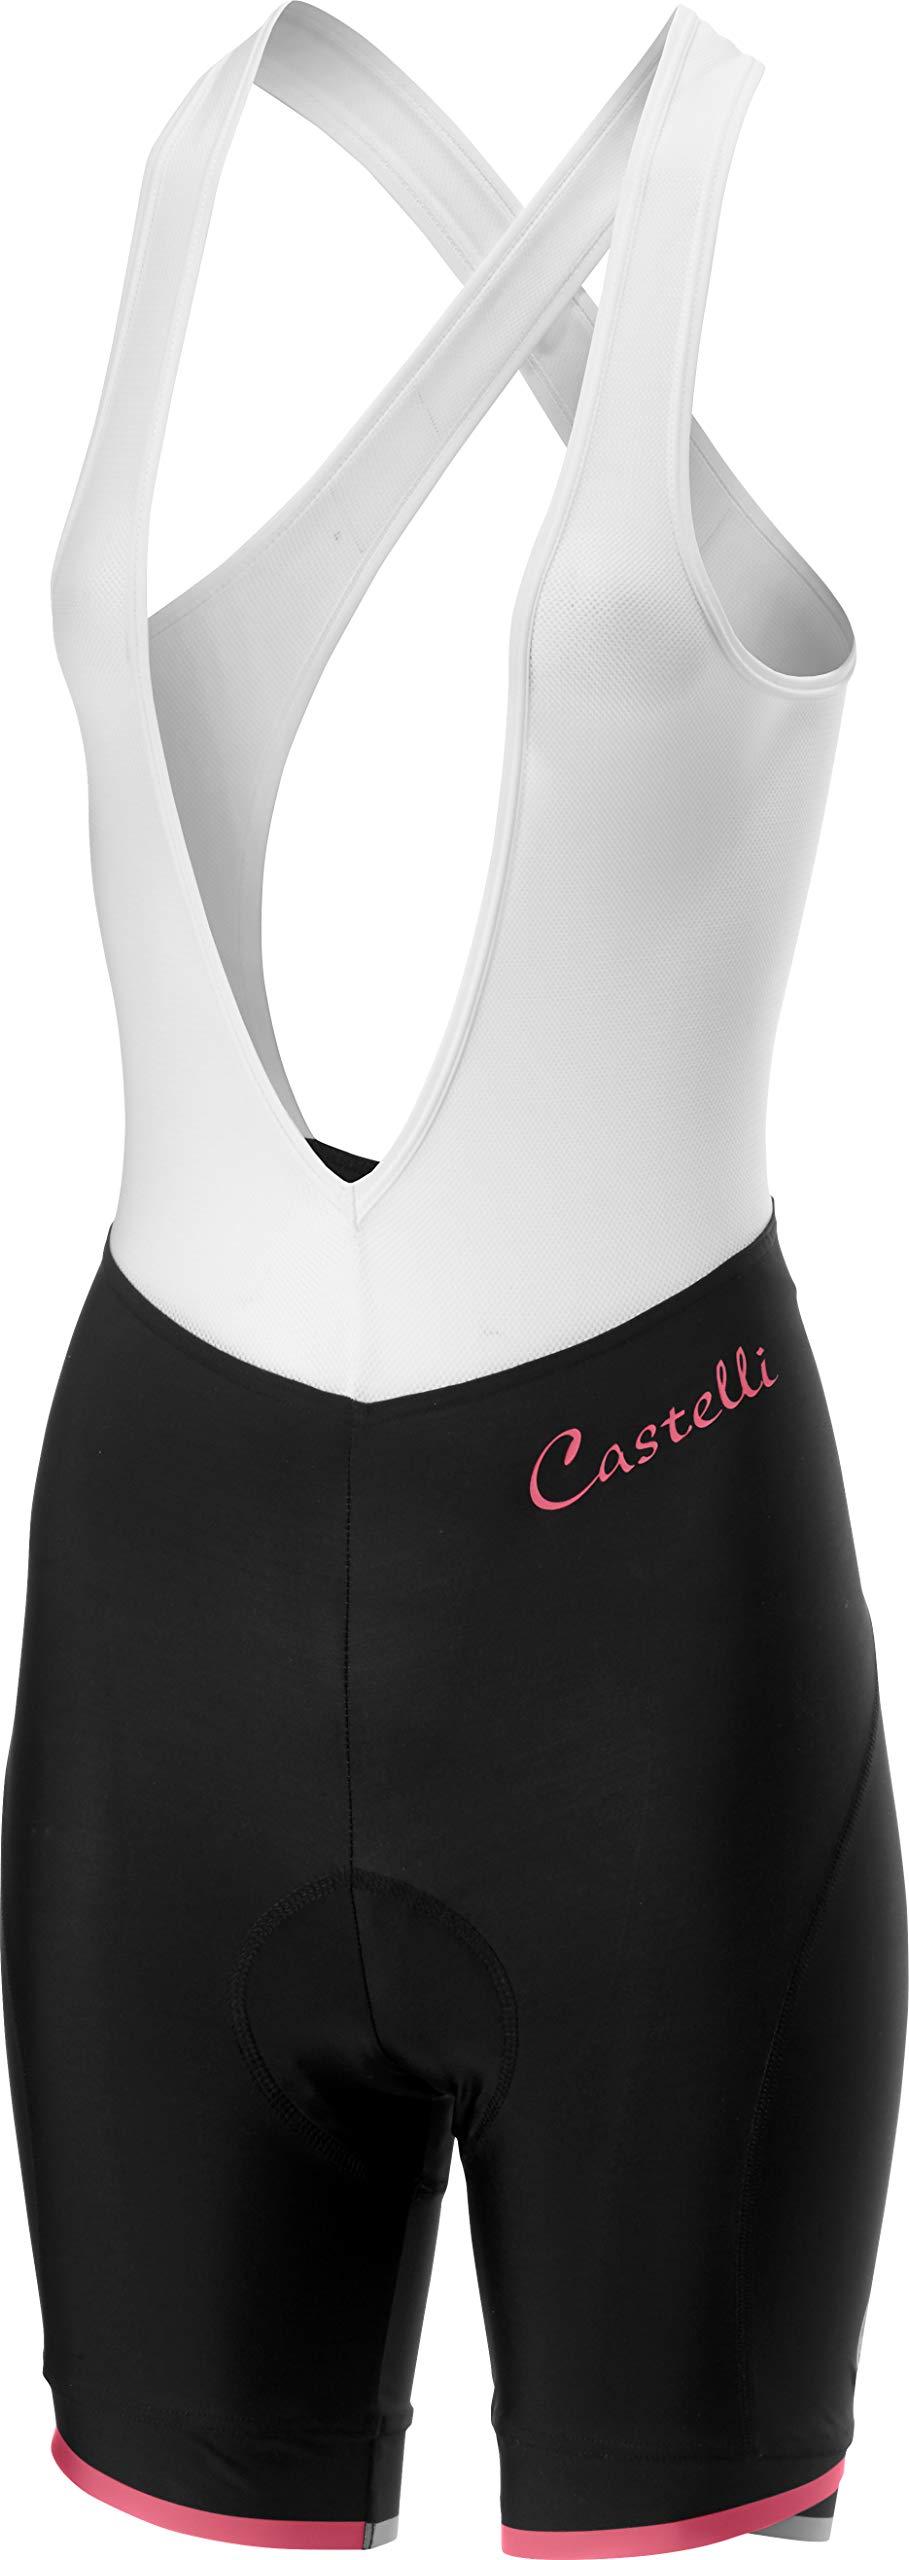 Castelli Vista Bibshort Black/Pink Size XL